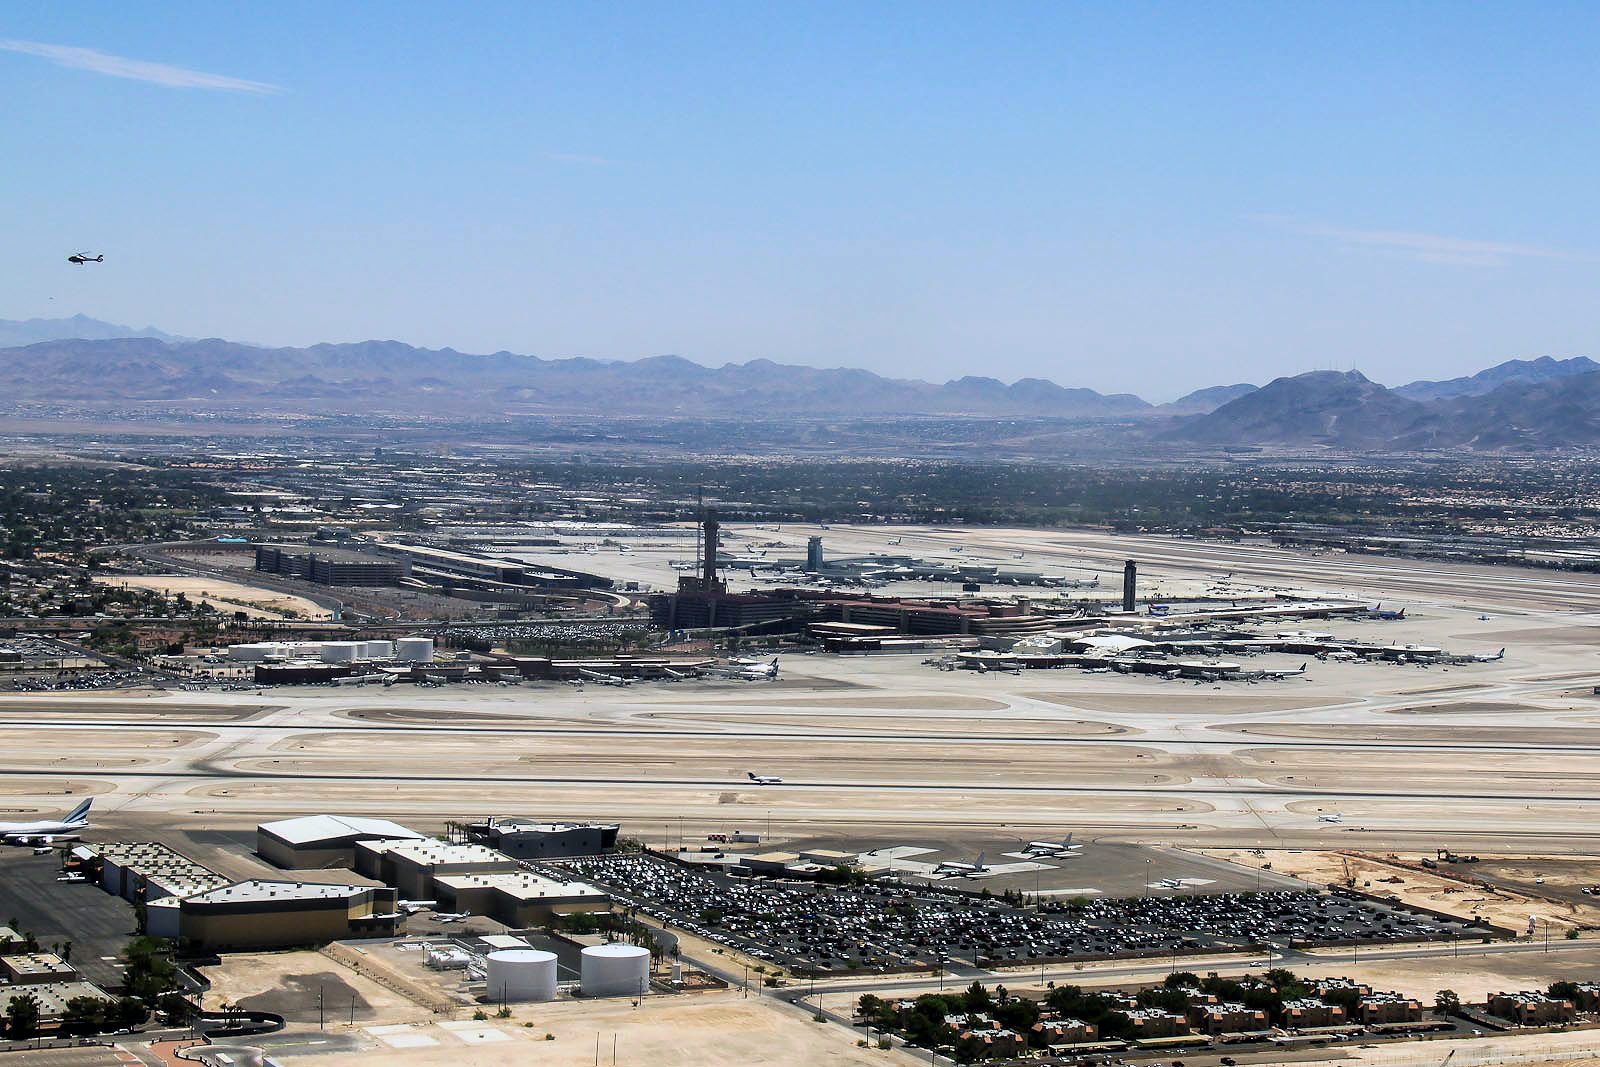 Вид на аэропорт Лас-Вегас Мак-Каран